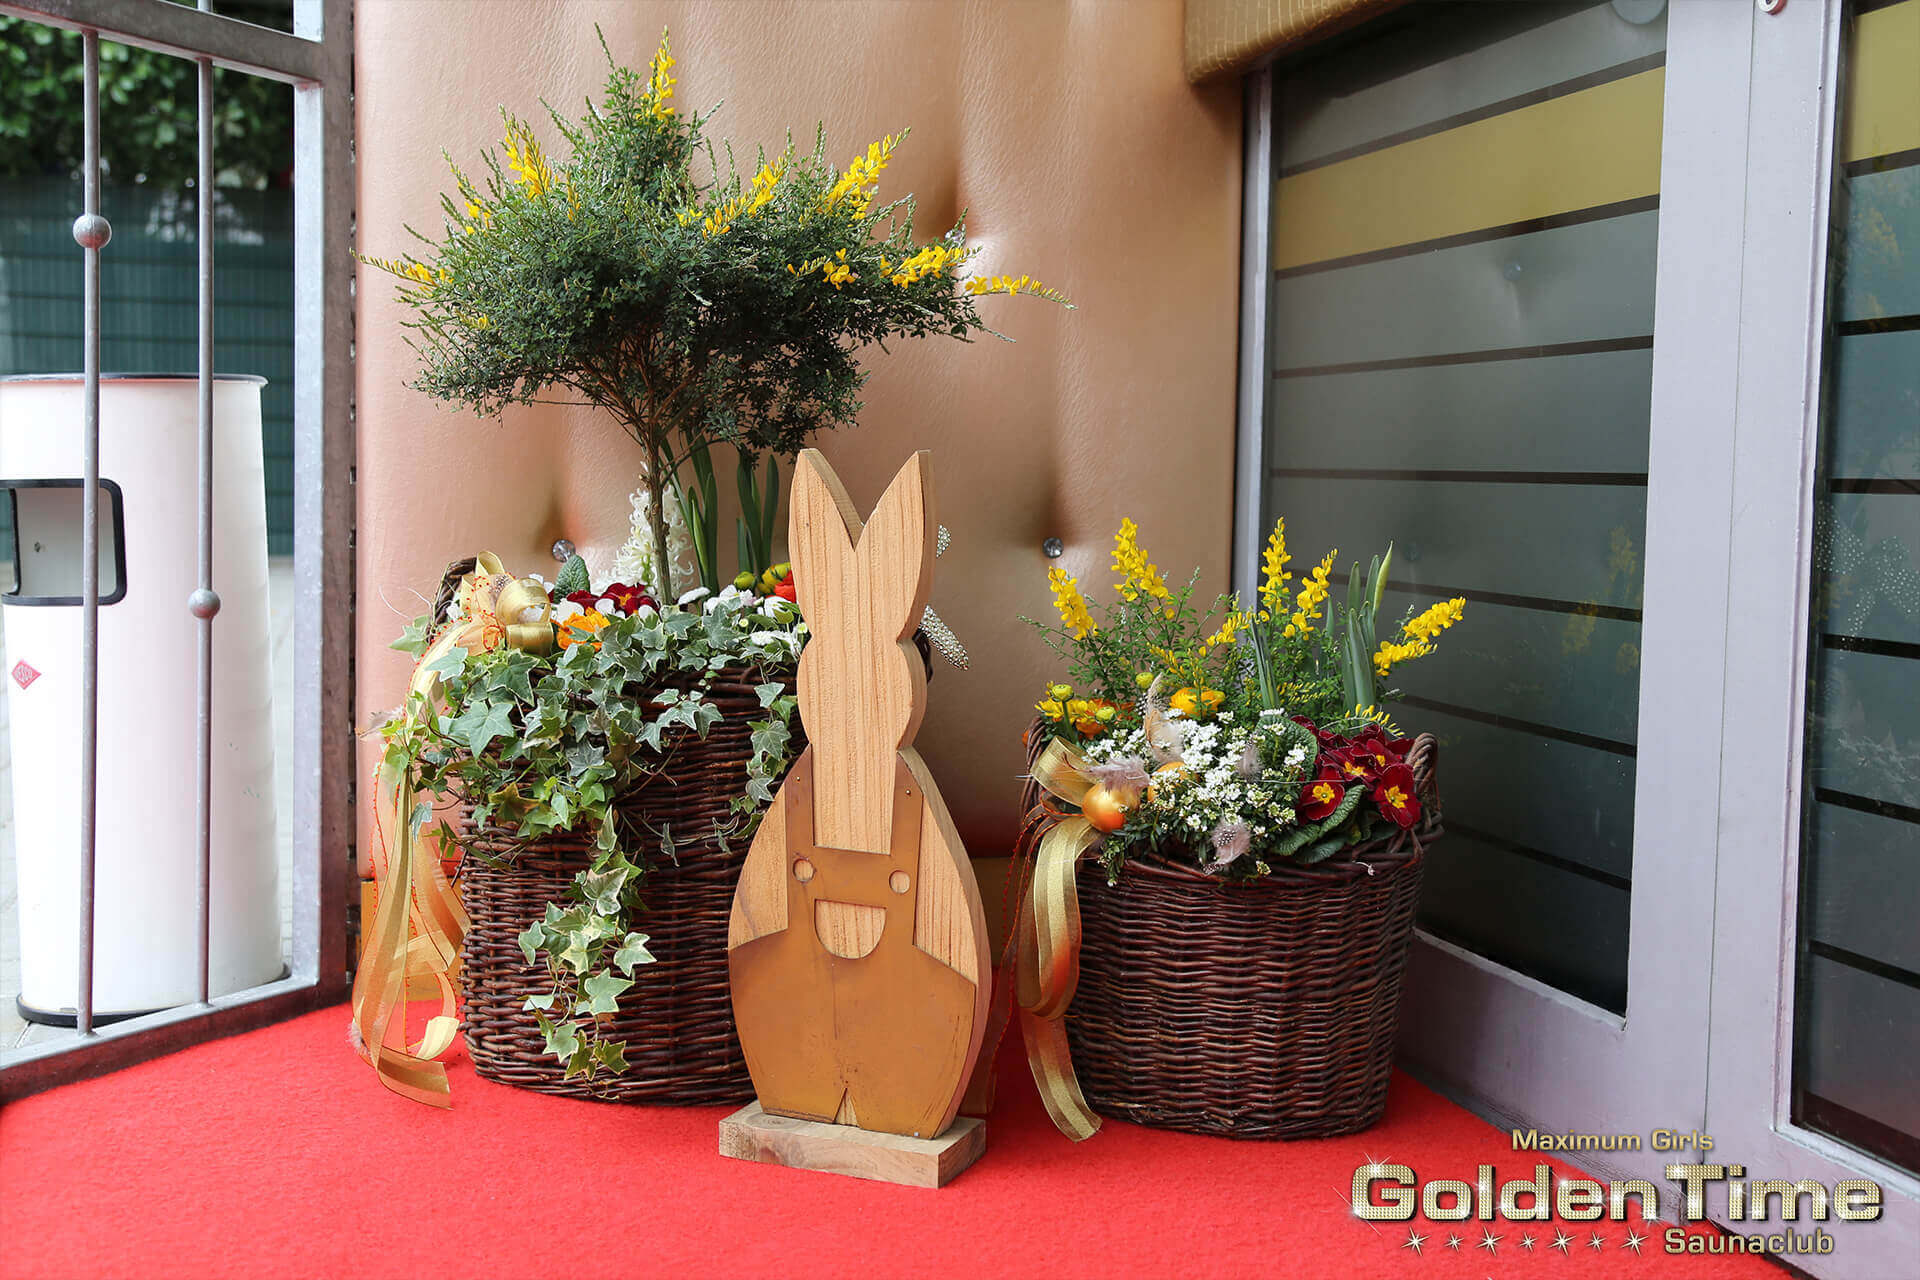 02-ostern-2016-pic-09-goldentime-saunaclub.jpg